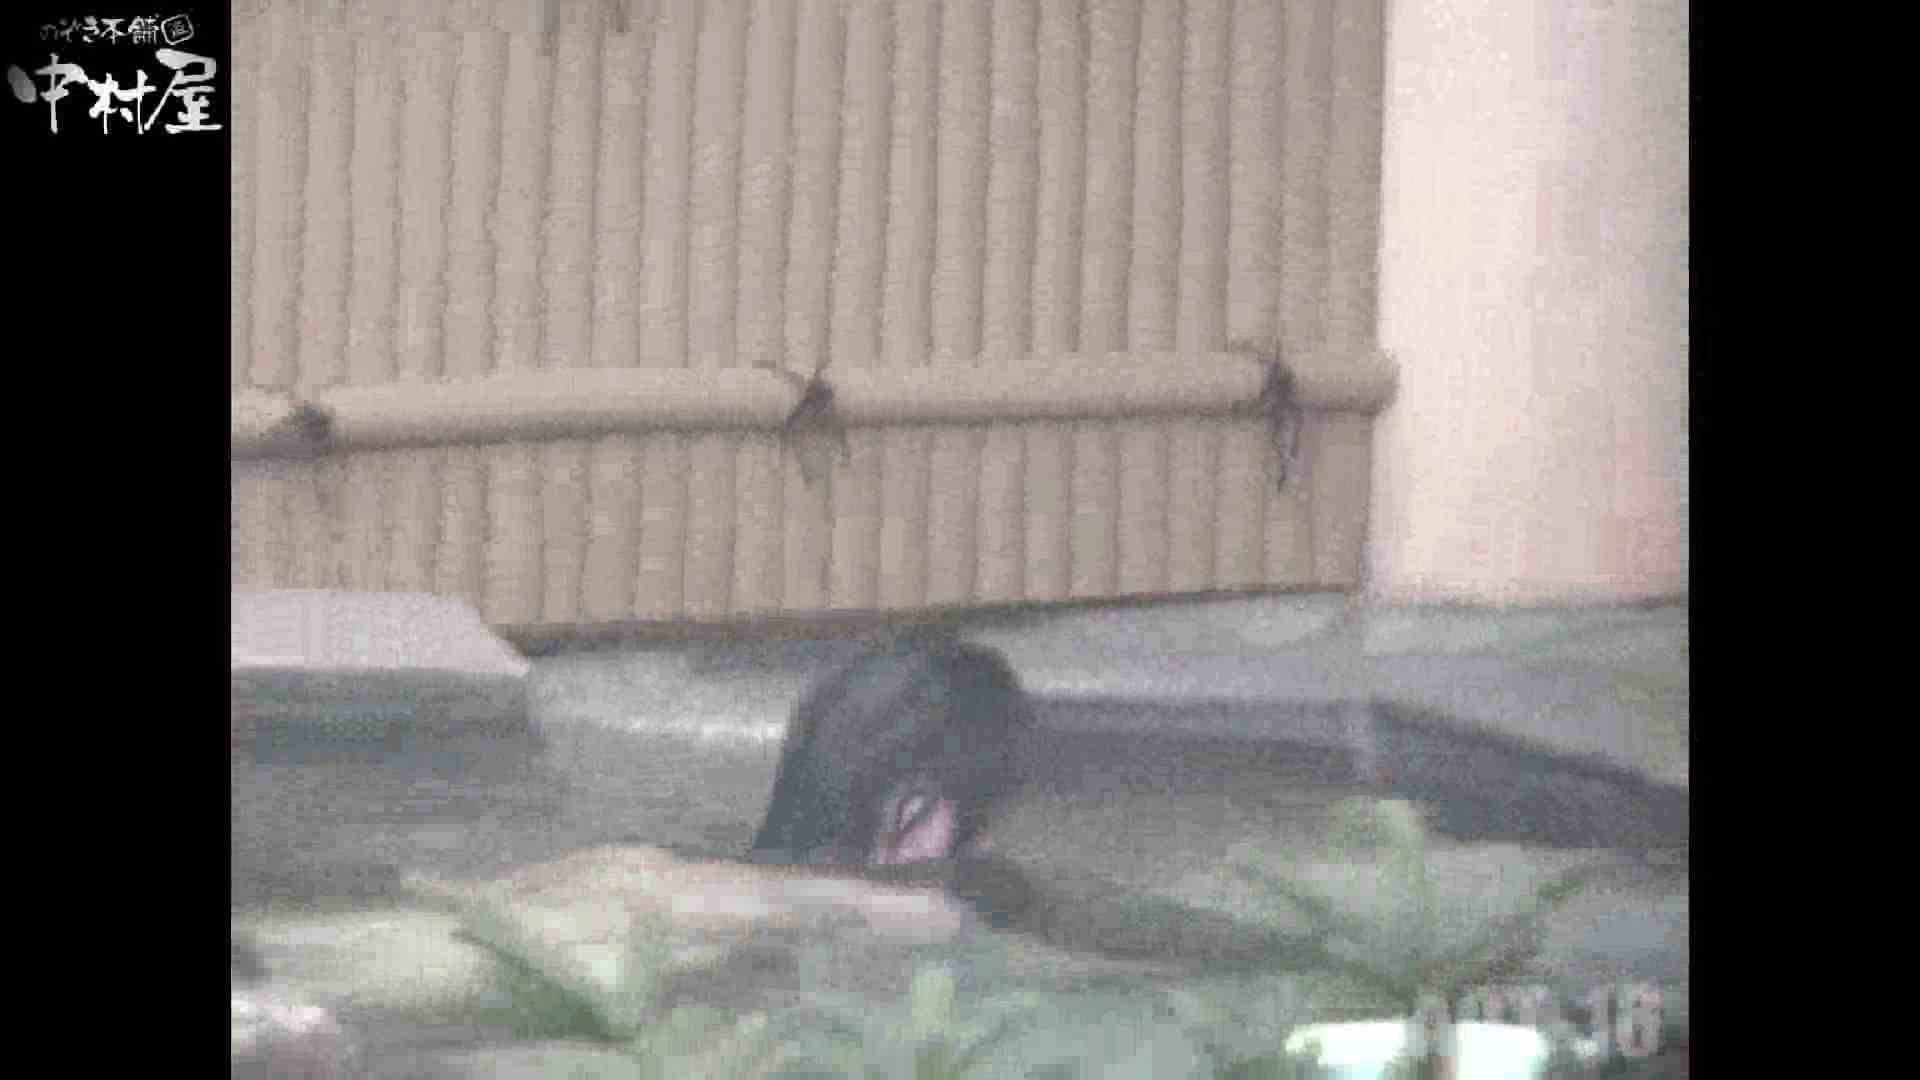 Aquaな露天風呂Vol.880潜入盗撮露天風呂十六判湯 其の八 潜入シリーズ | 盗撮  84pic 11